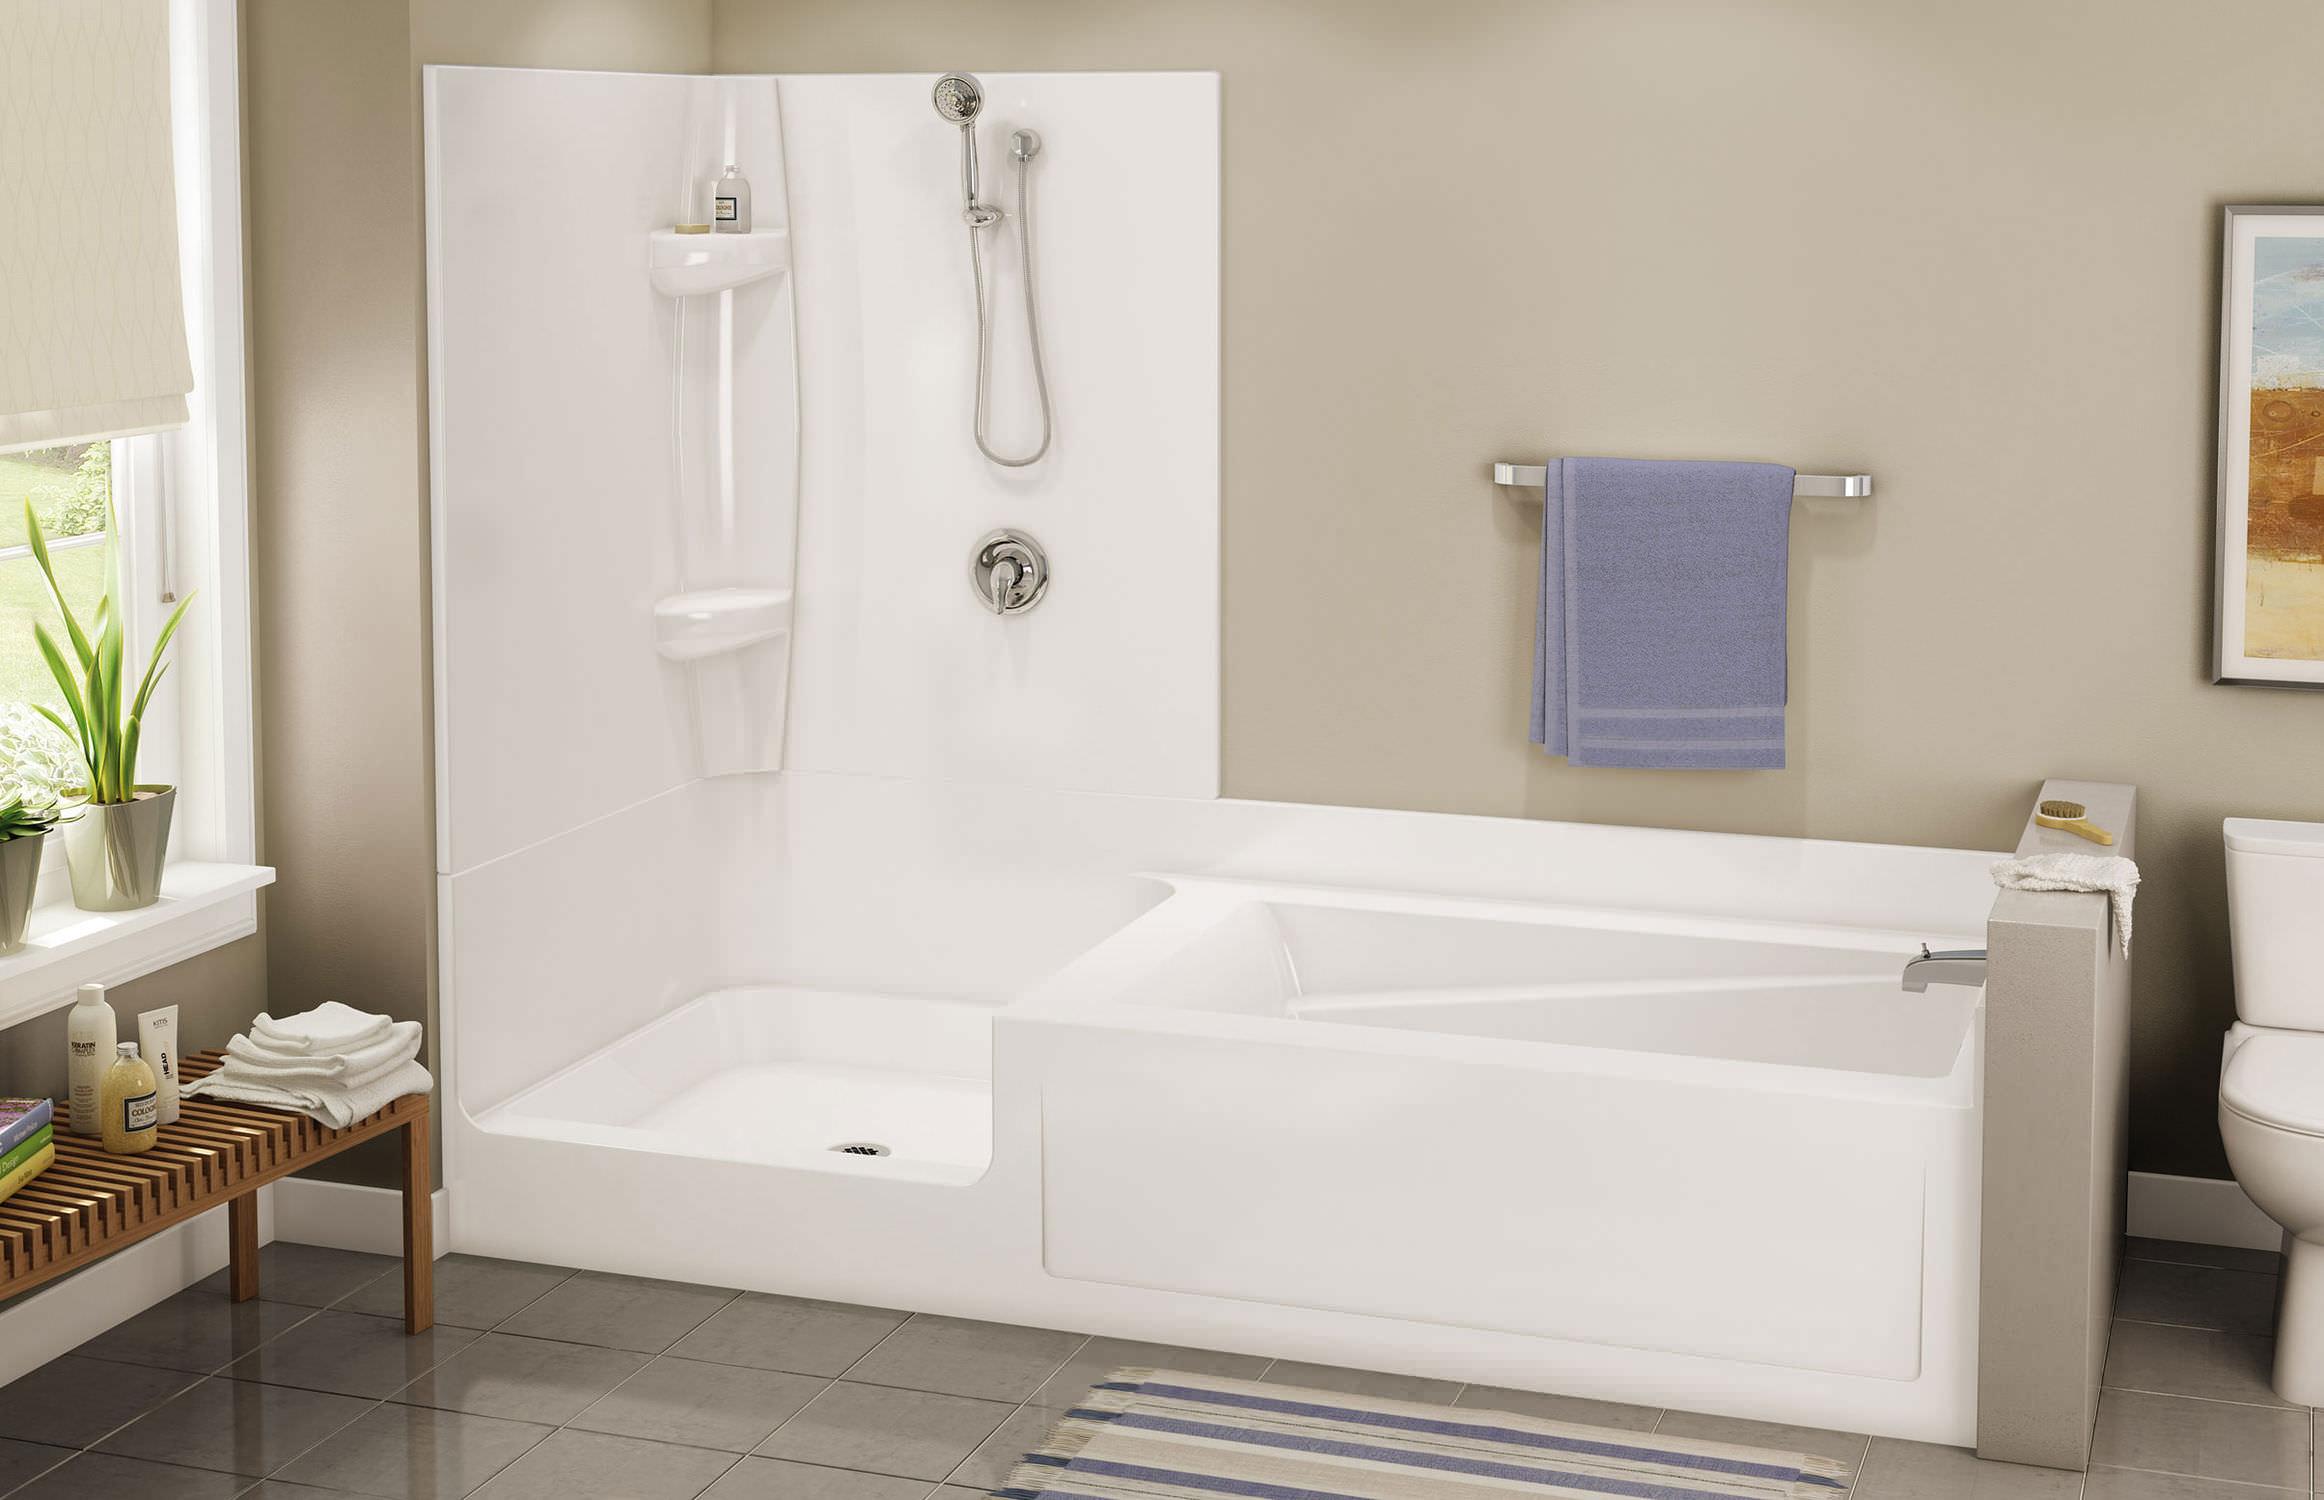 Vasca Da Bagno Rettangolare : Hafro bolla vasca idromassaggio airpool bagno e wellness vasche da